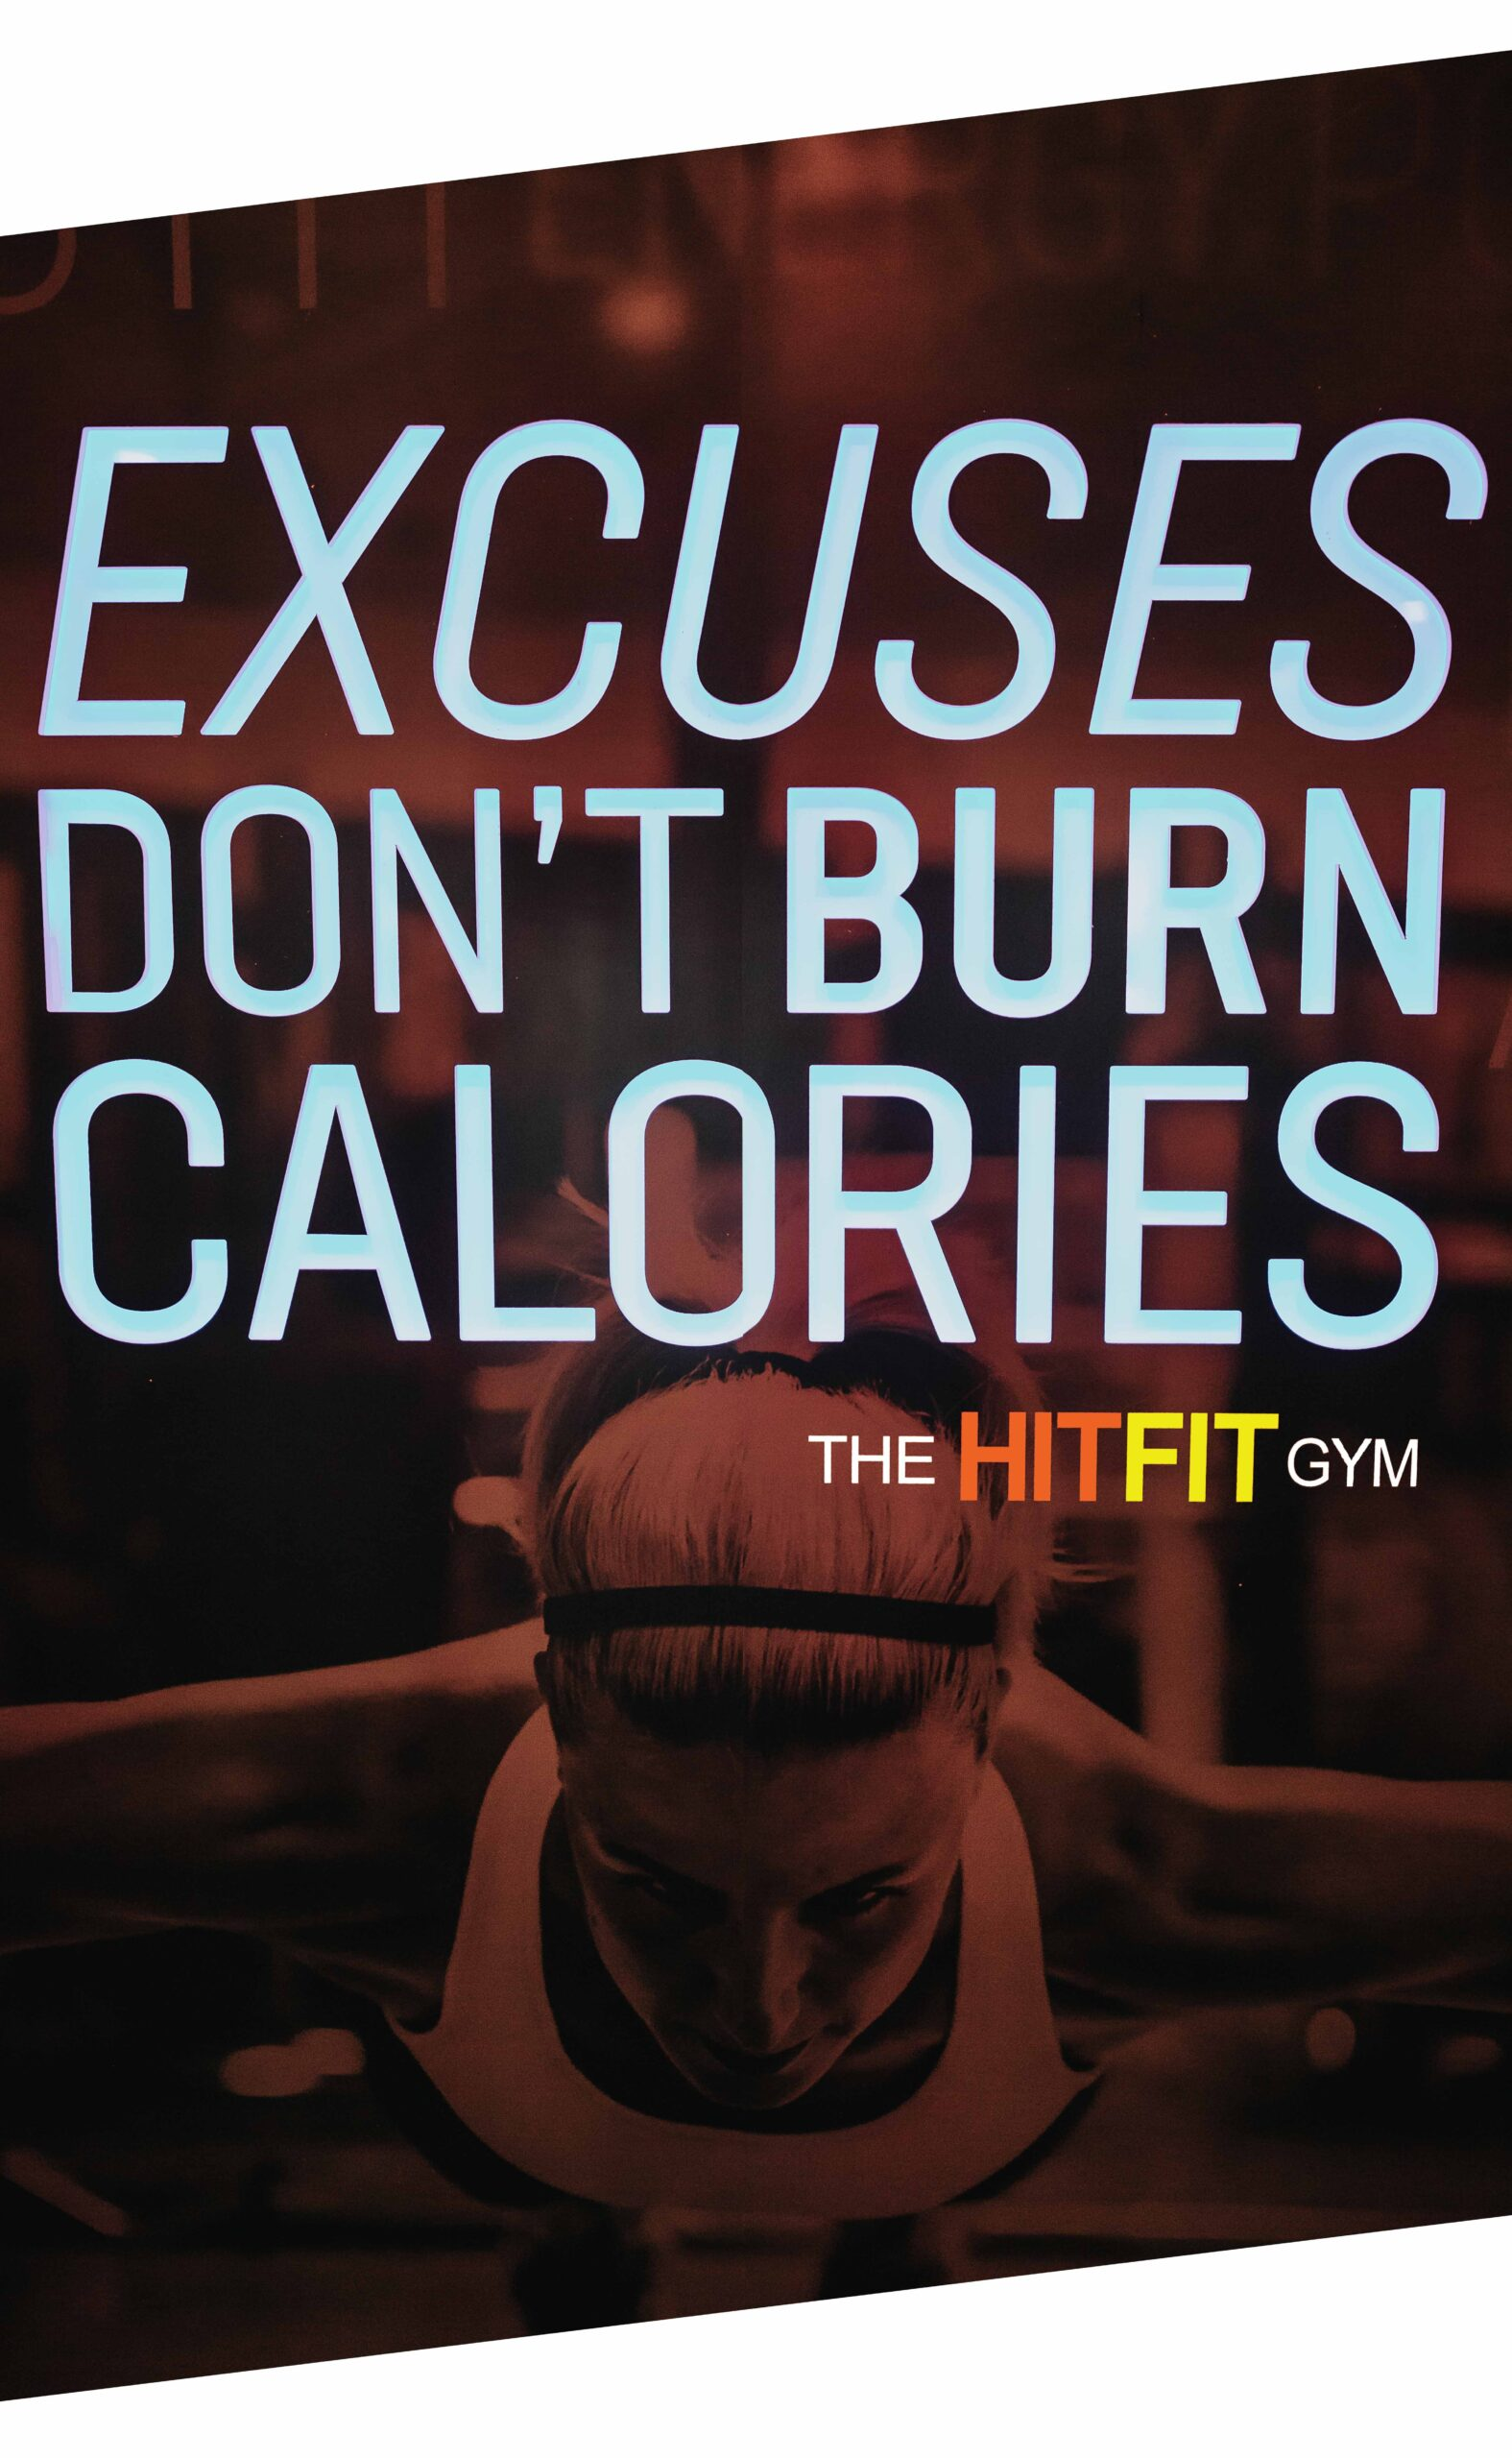 Excuses Don't Brun Calories